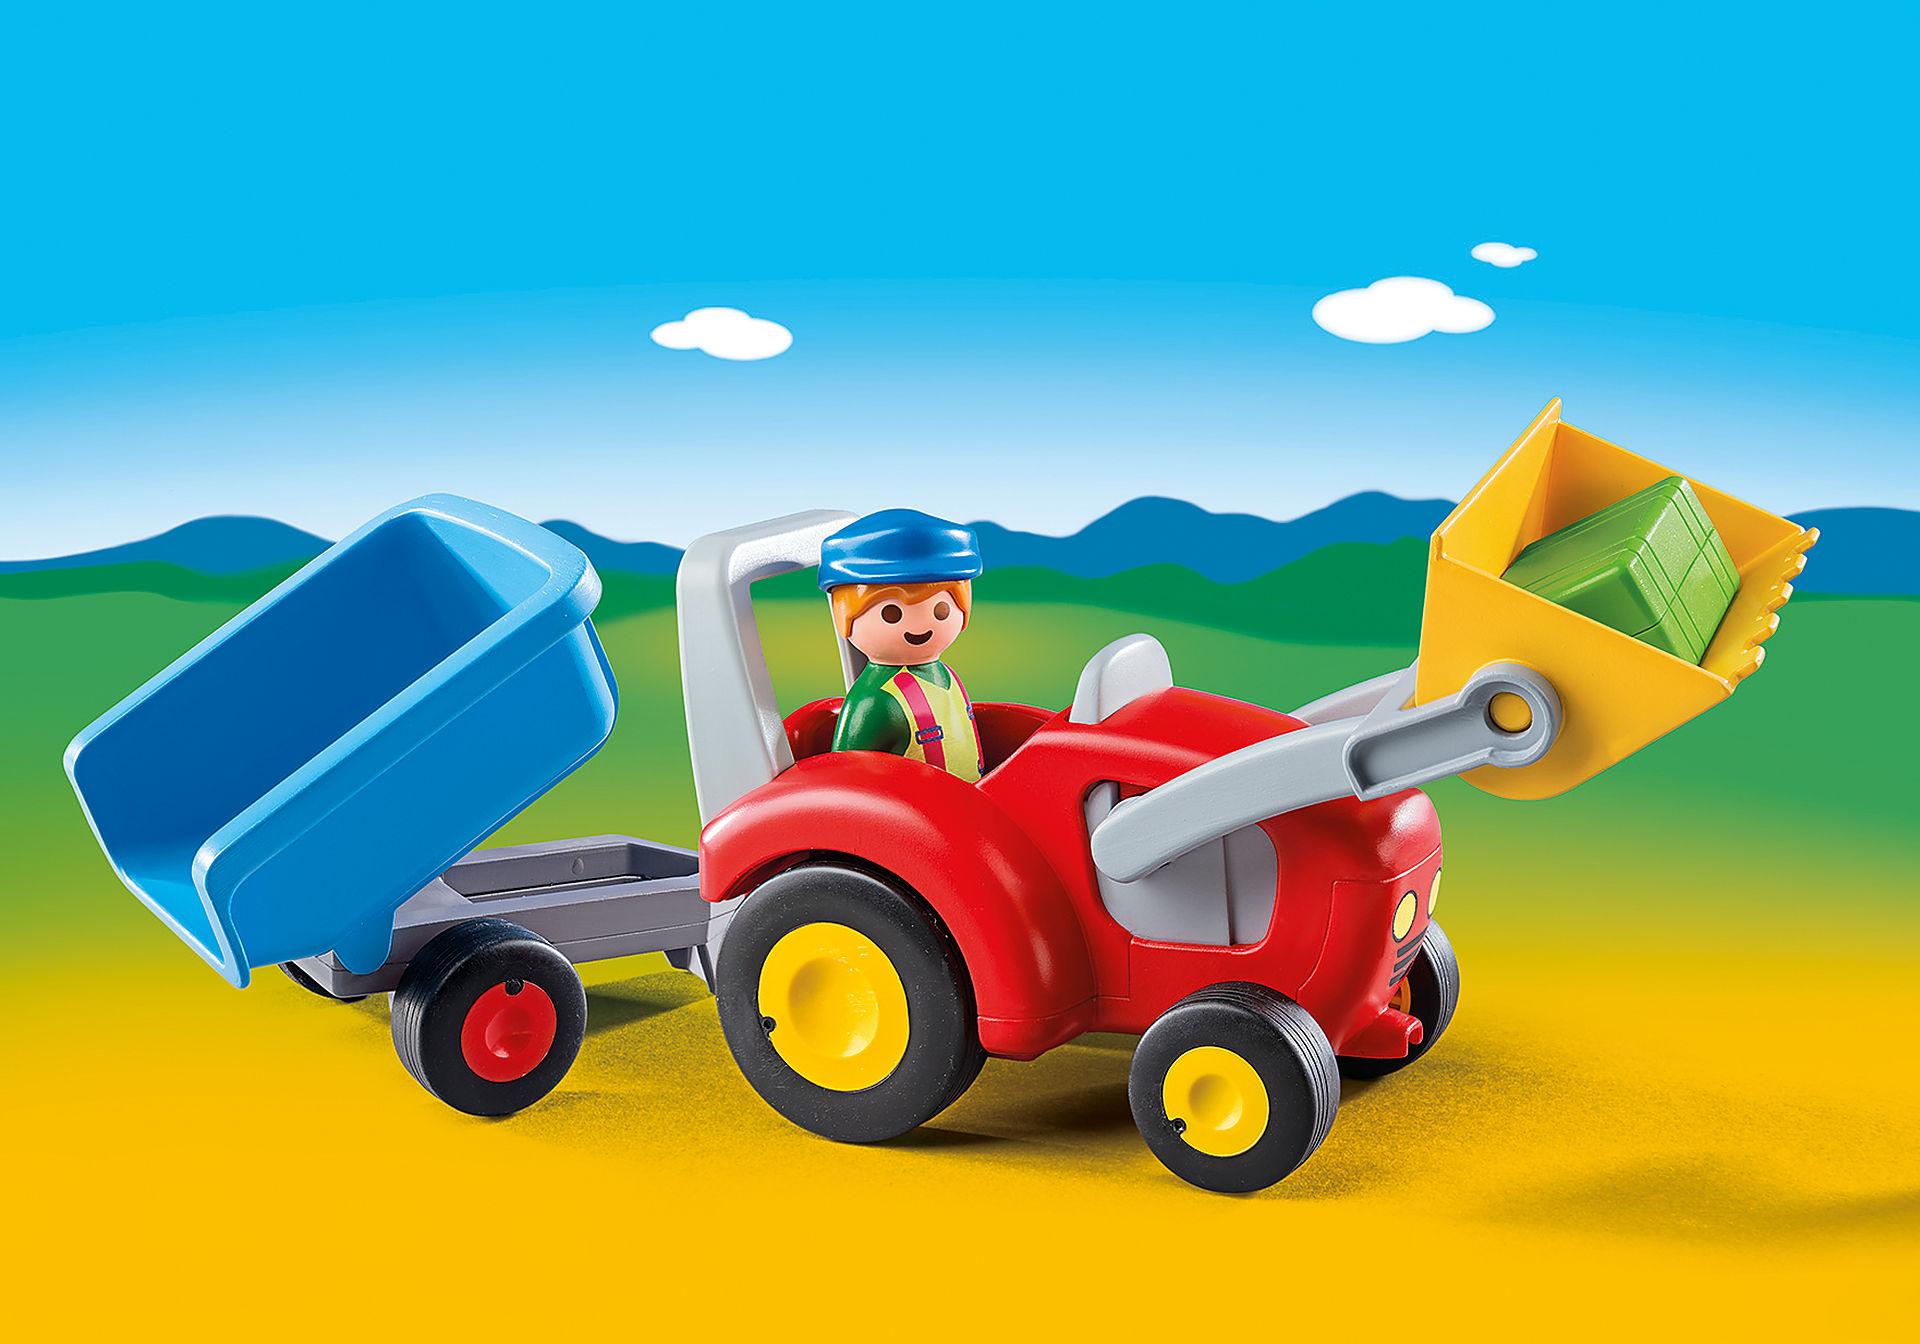 6964 Traktor mit Anhänger zoom image1